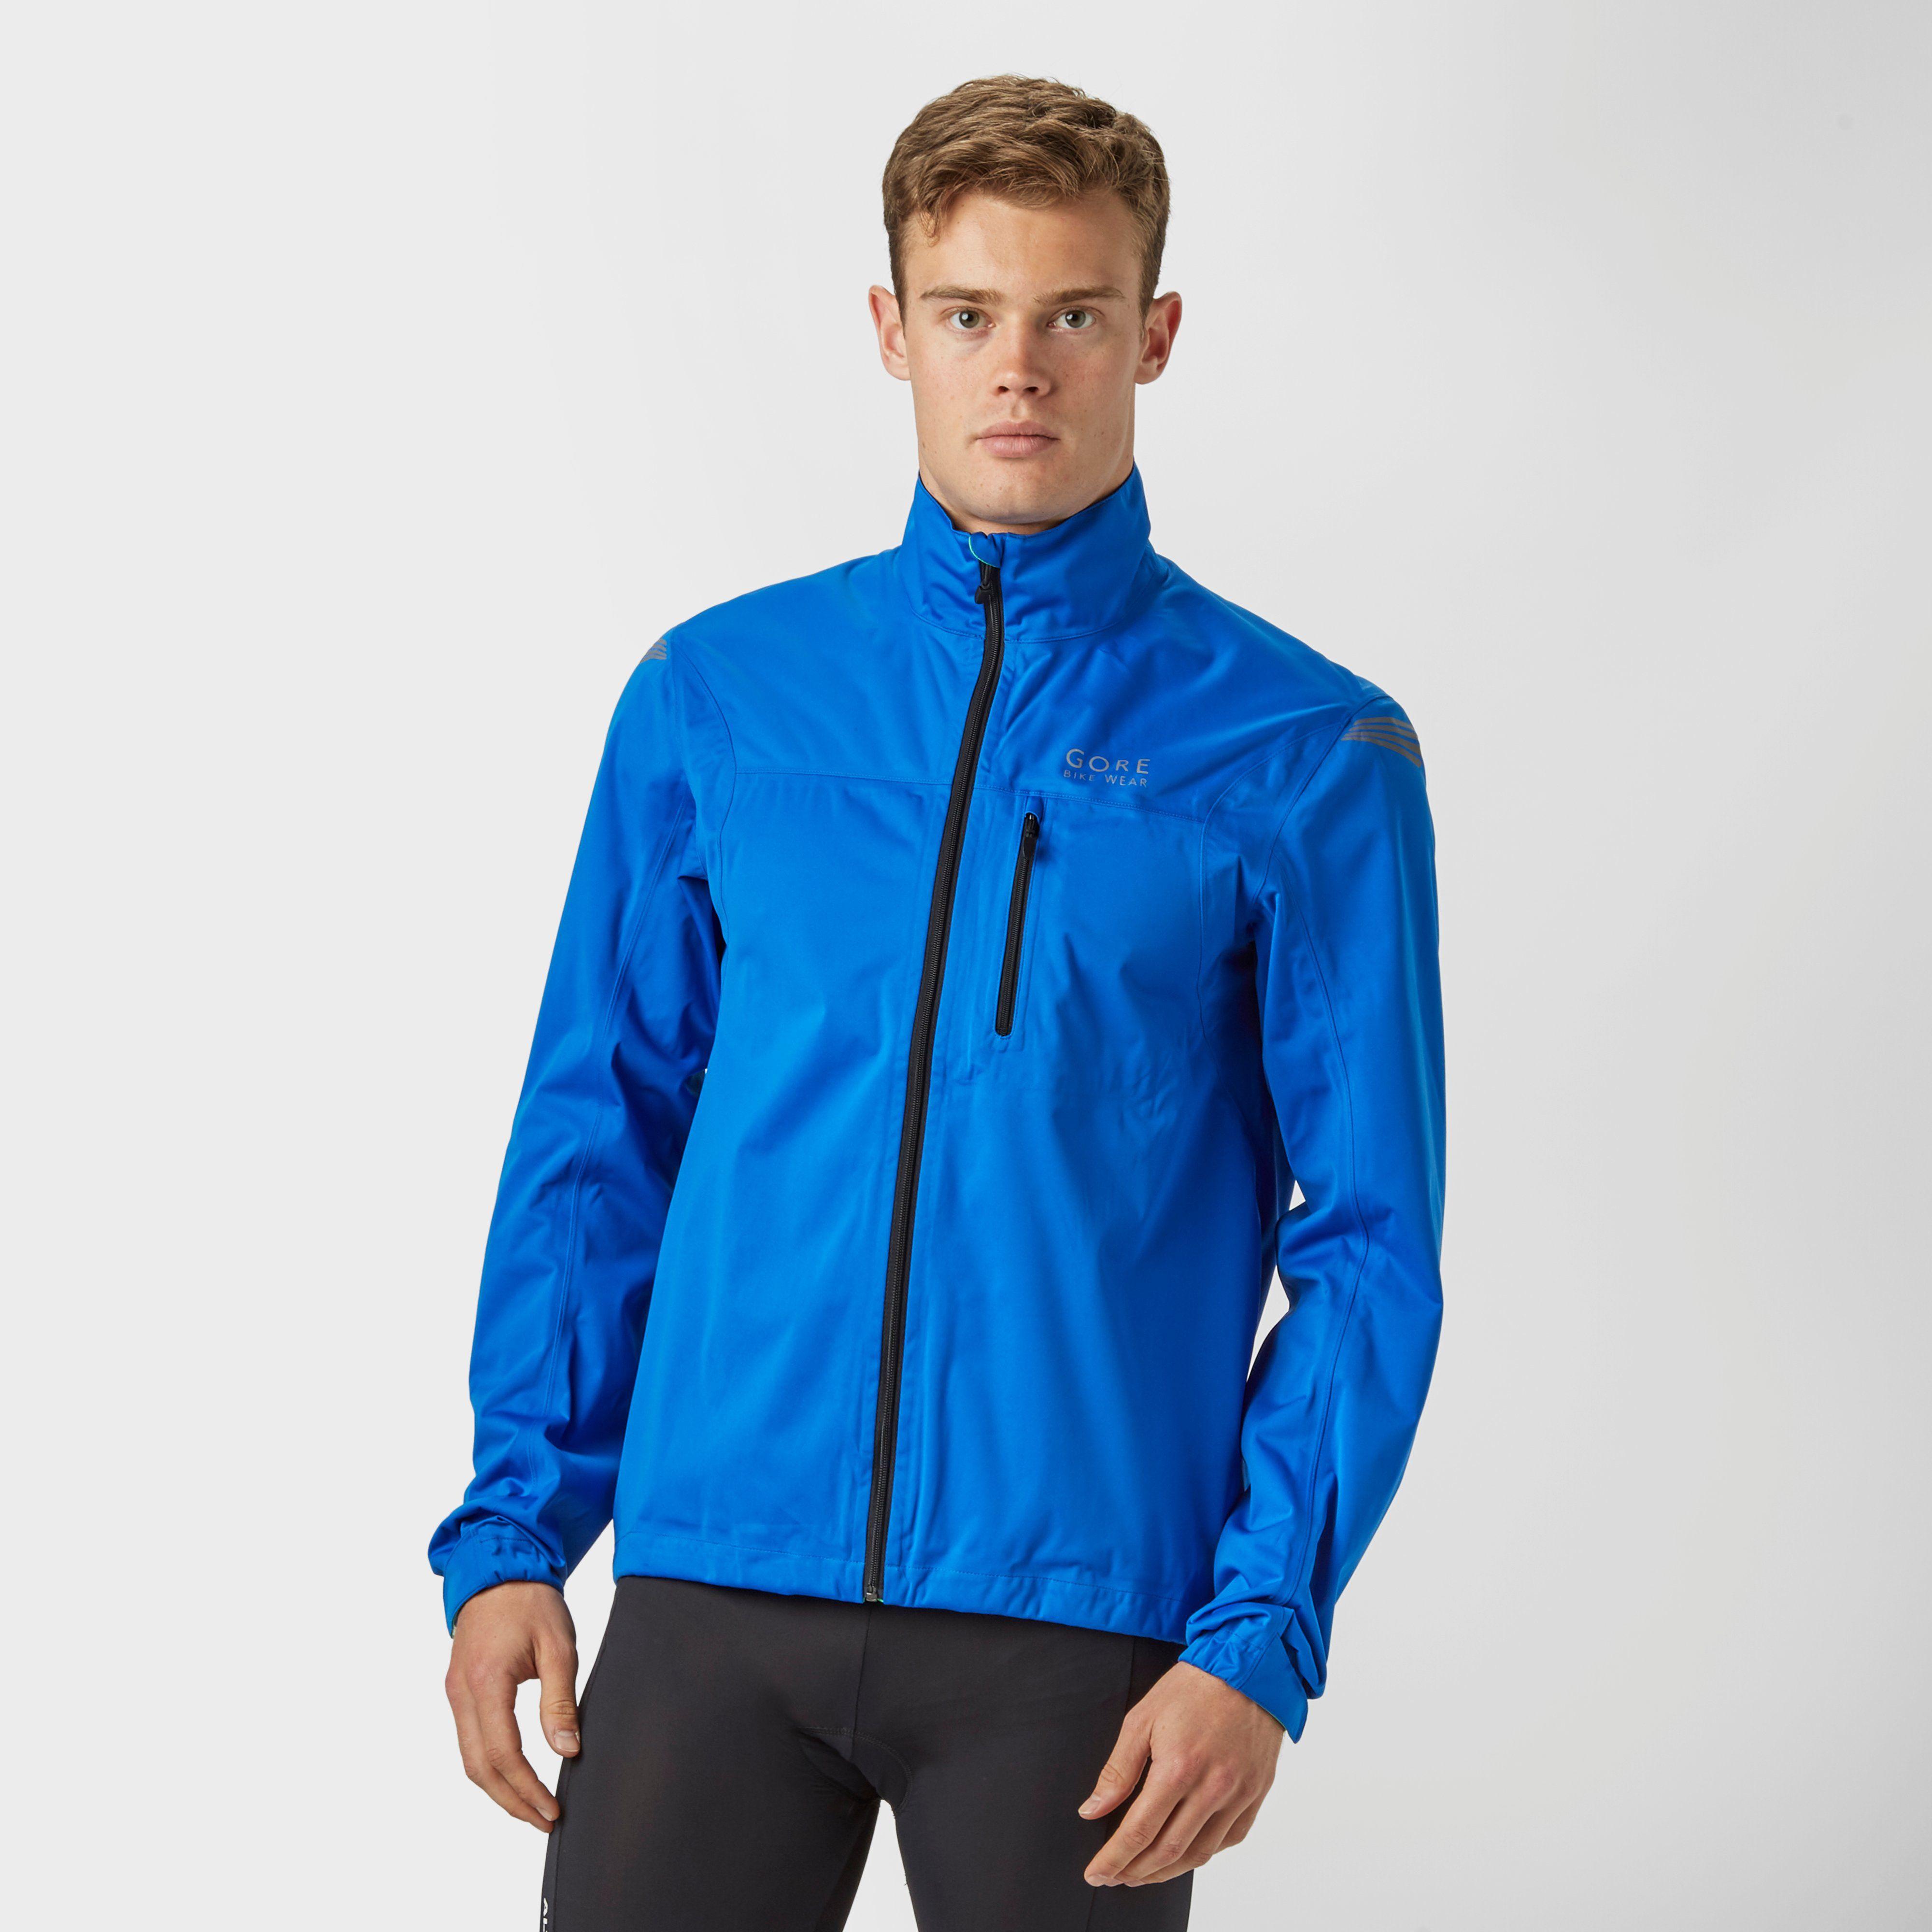 GORE Men's Element GORE-TEX® Active Shell Jacket